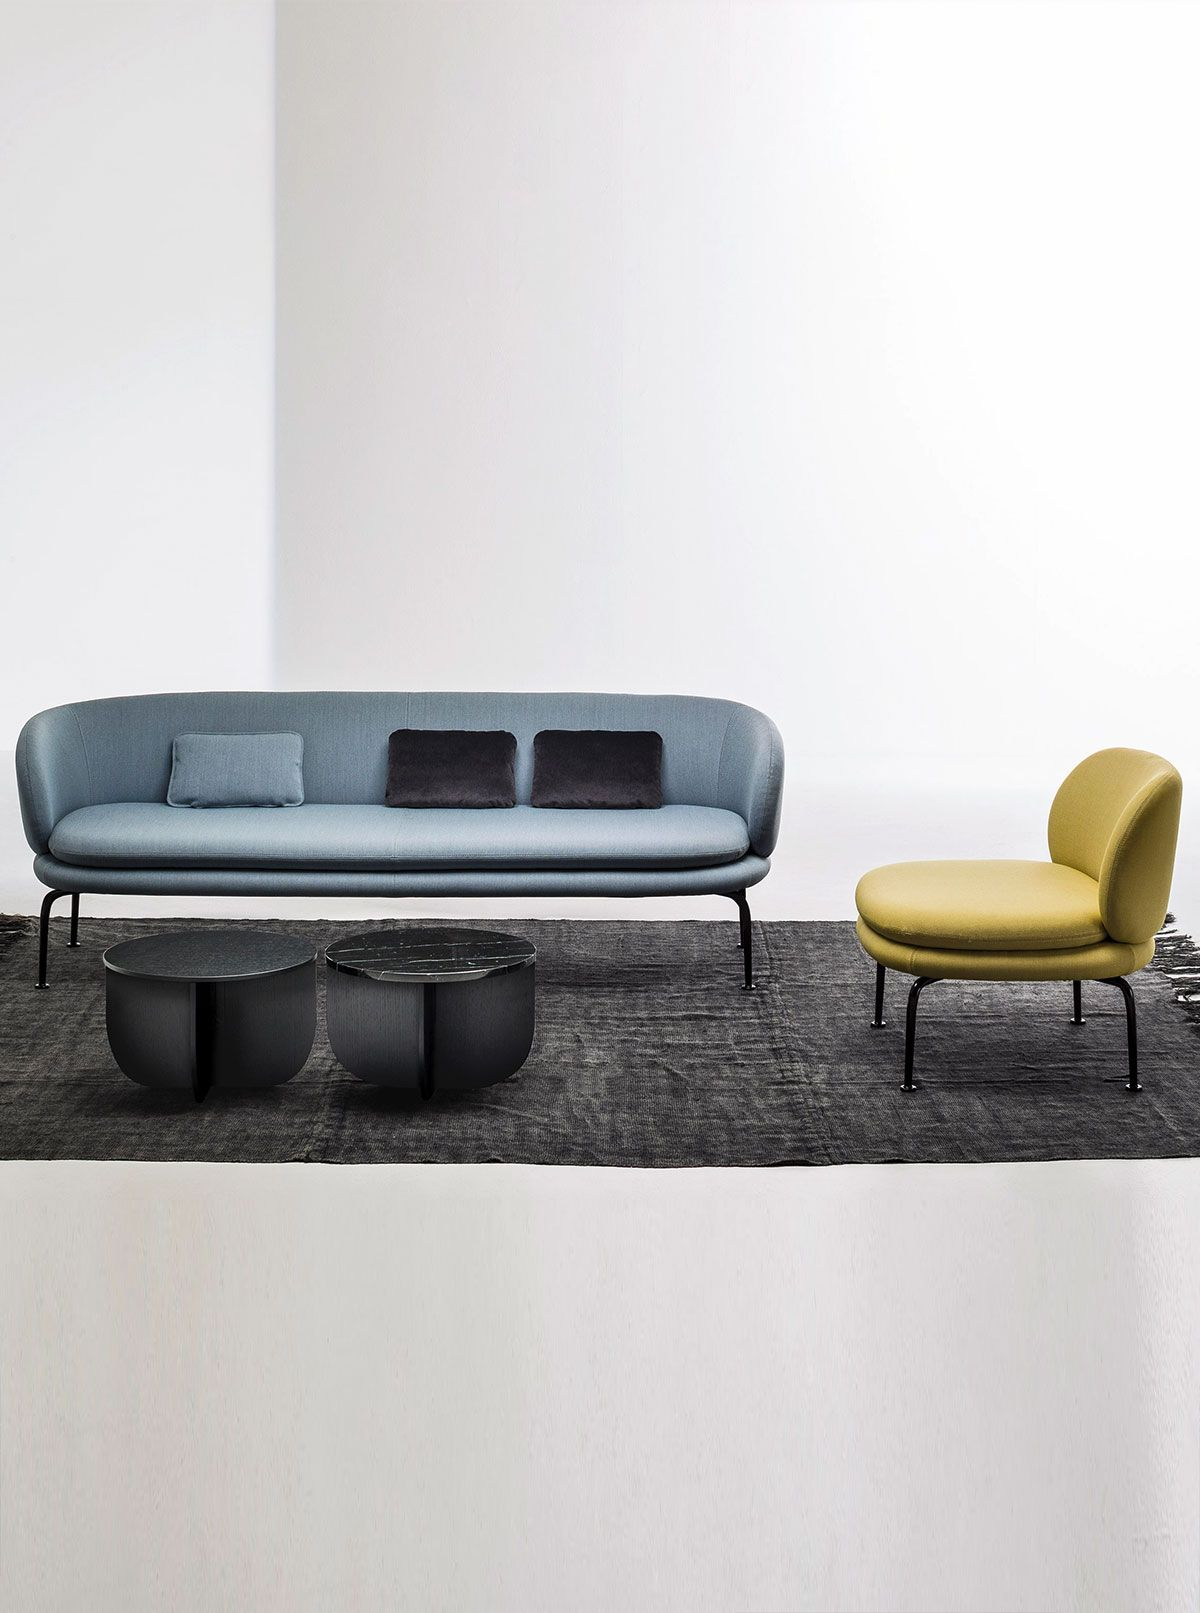 Soave By La Cividina Modern Armchairs Comfy Living Room Furniture Furniture Stylish Sofa